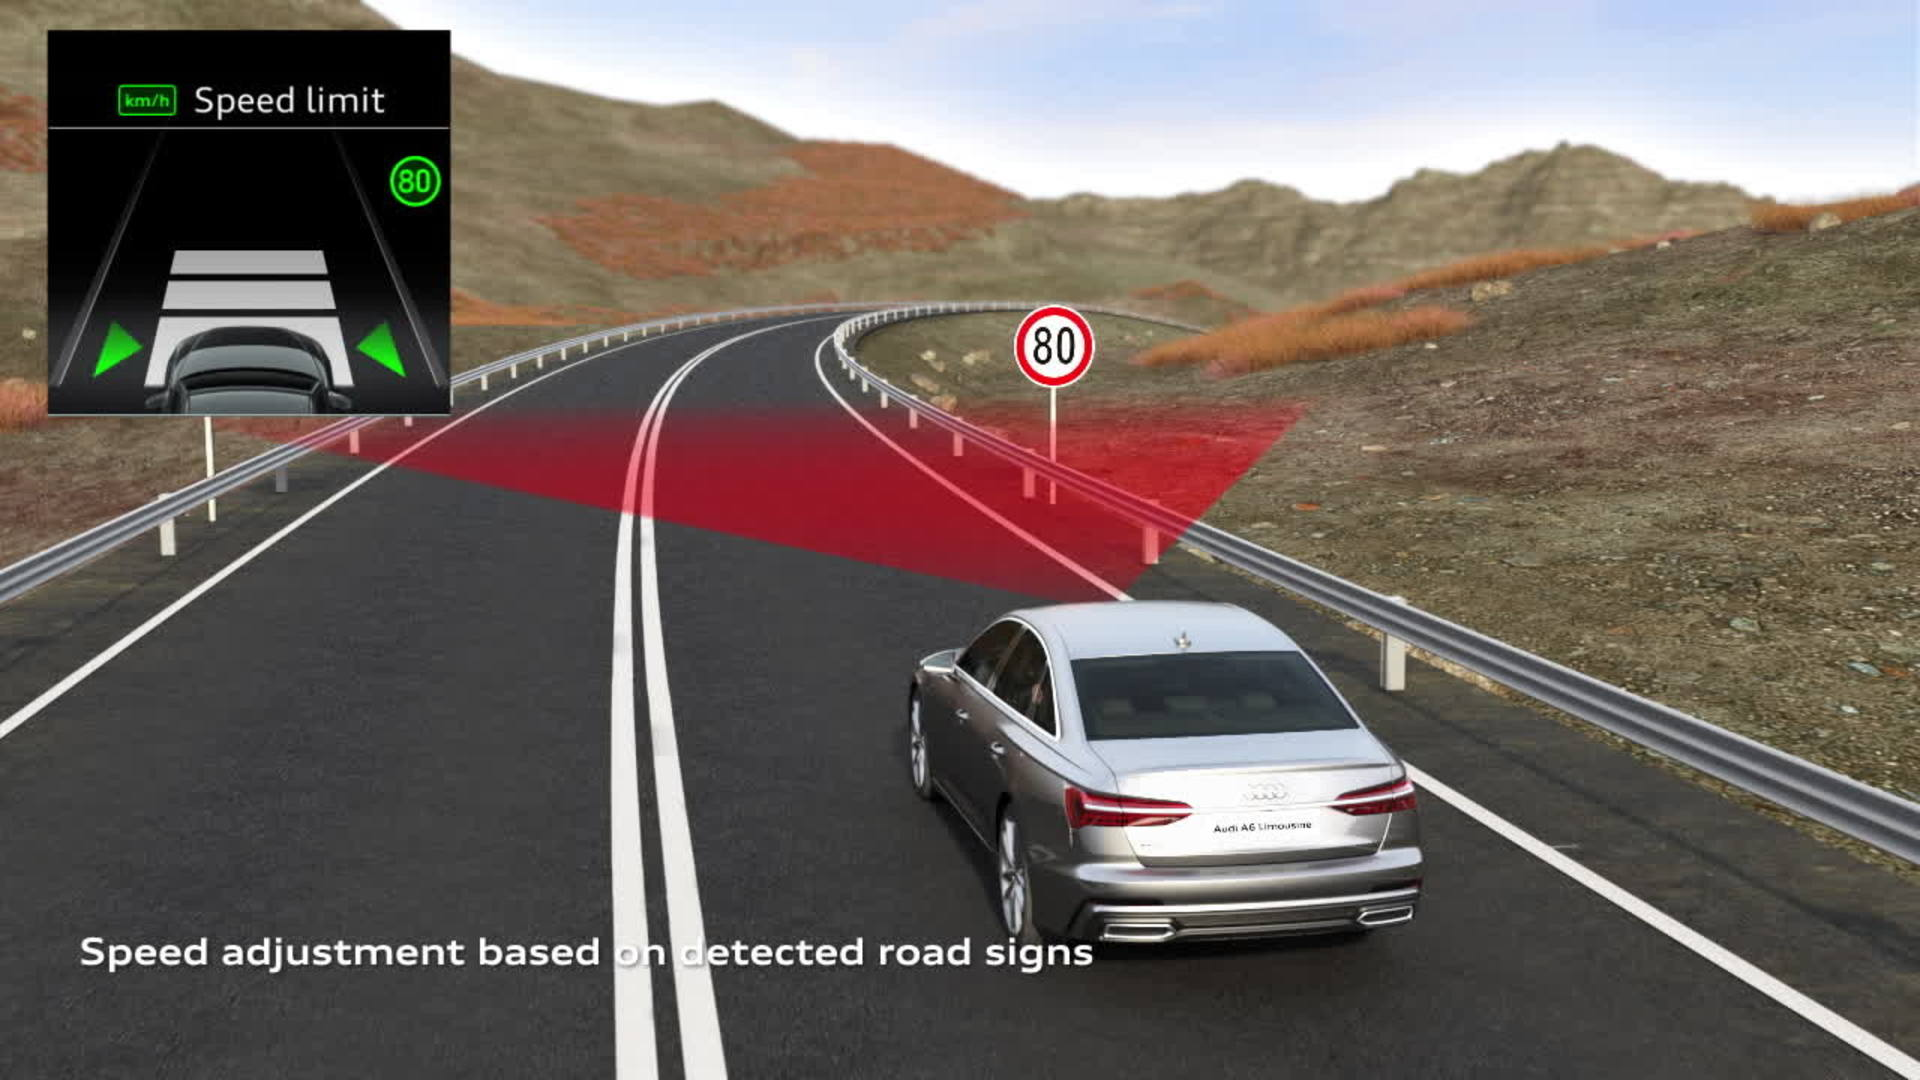 Animation Audi A6 Adaptive cruise assist